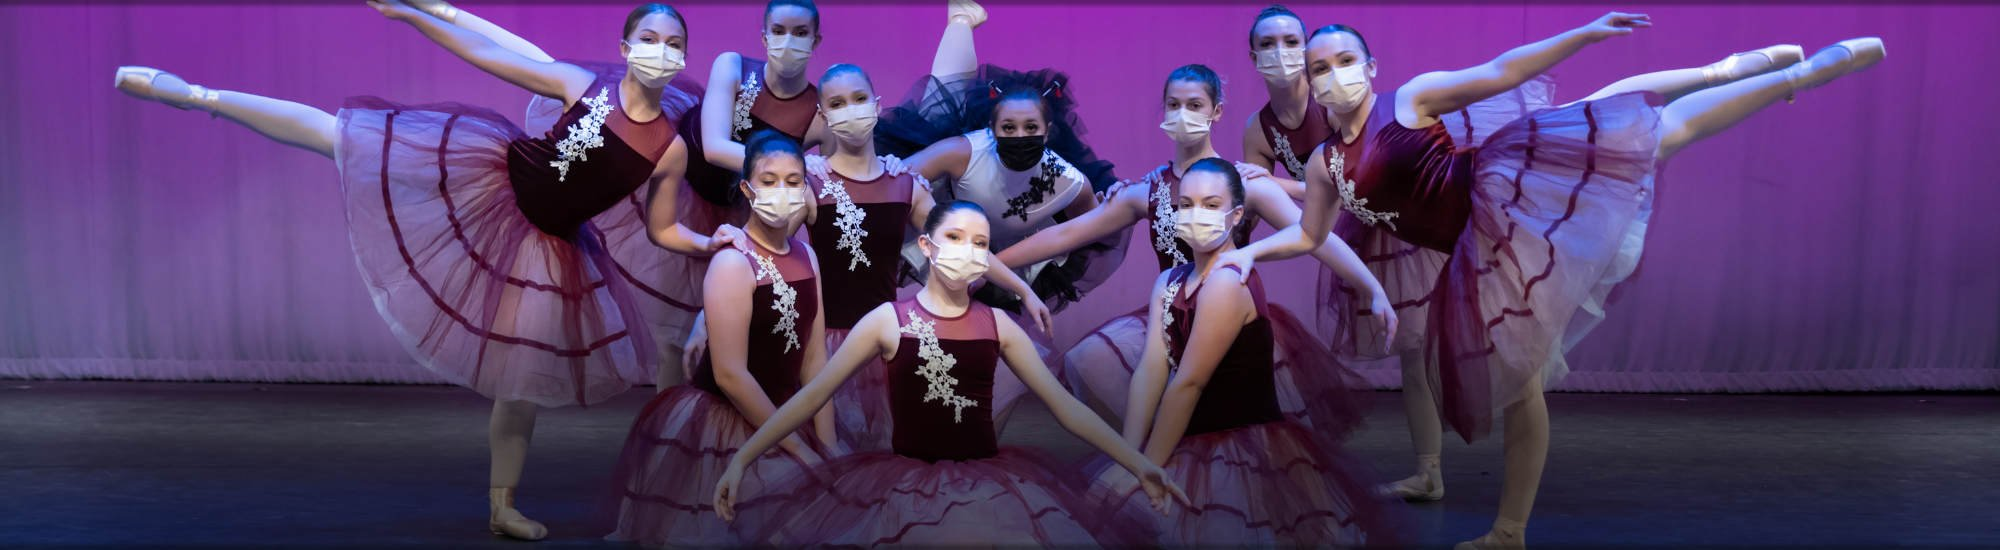 Tap Dance Class Manchester Connecticut